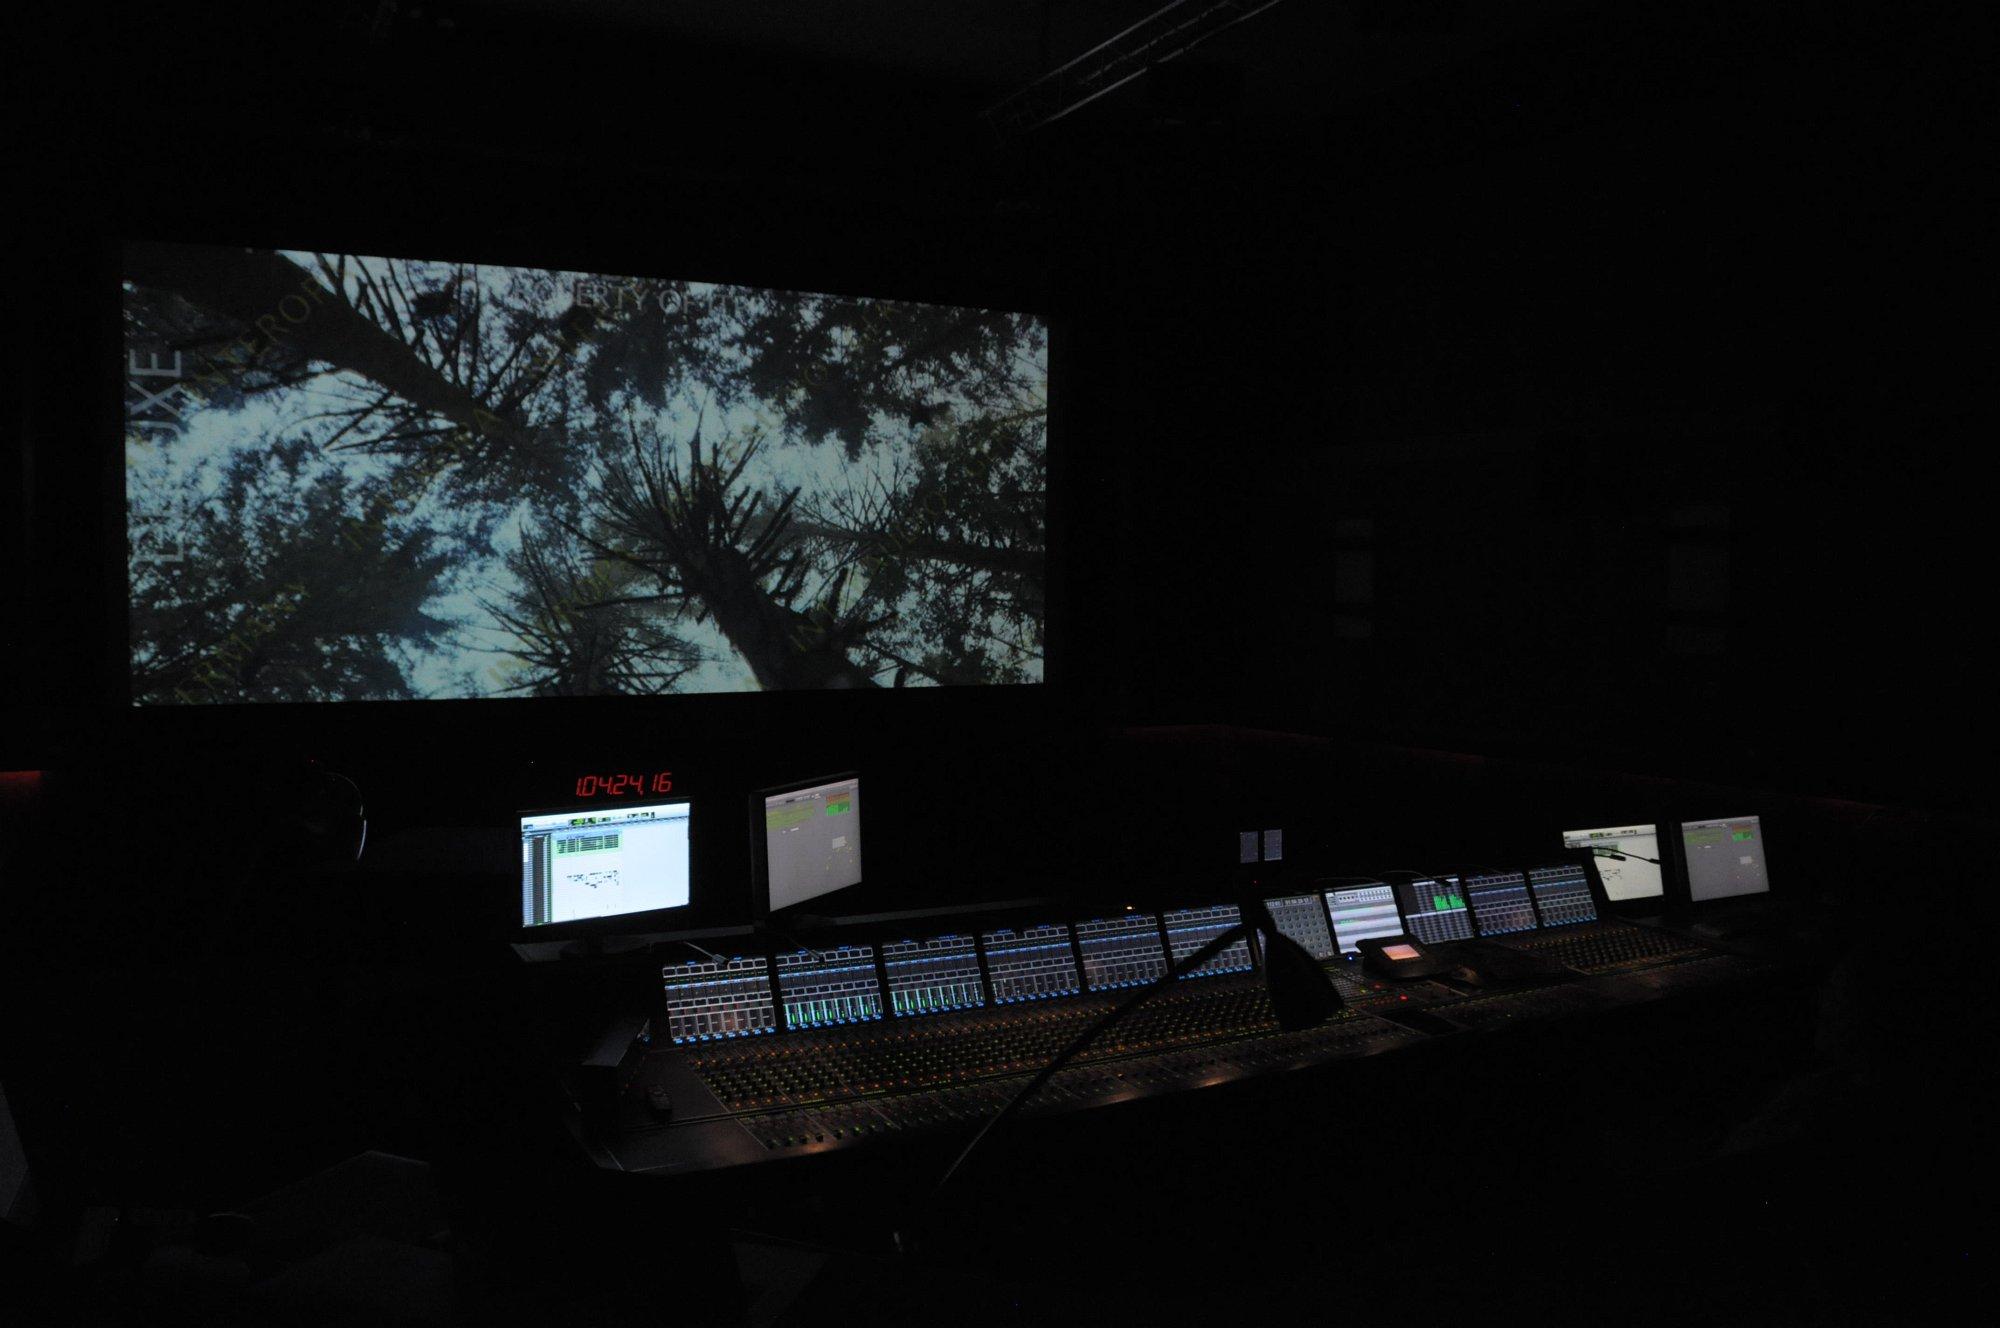 Dolby Atmos Probe gehört: Klang aus der Decke kommt fürs Heimkino - Dolby Atmos im Tonstudio (Foto: Andreas Sebayang/Golem.de)